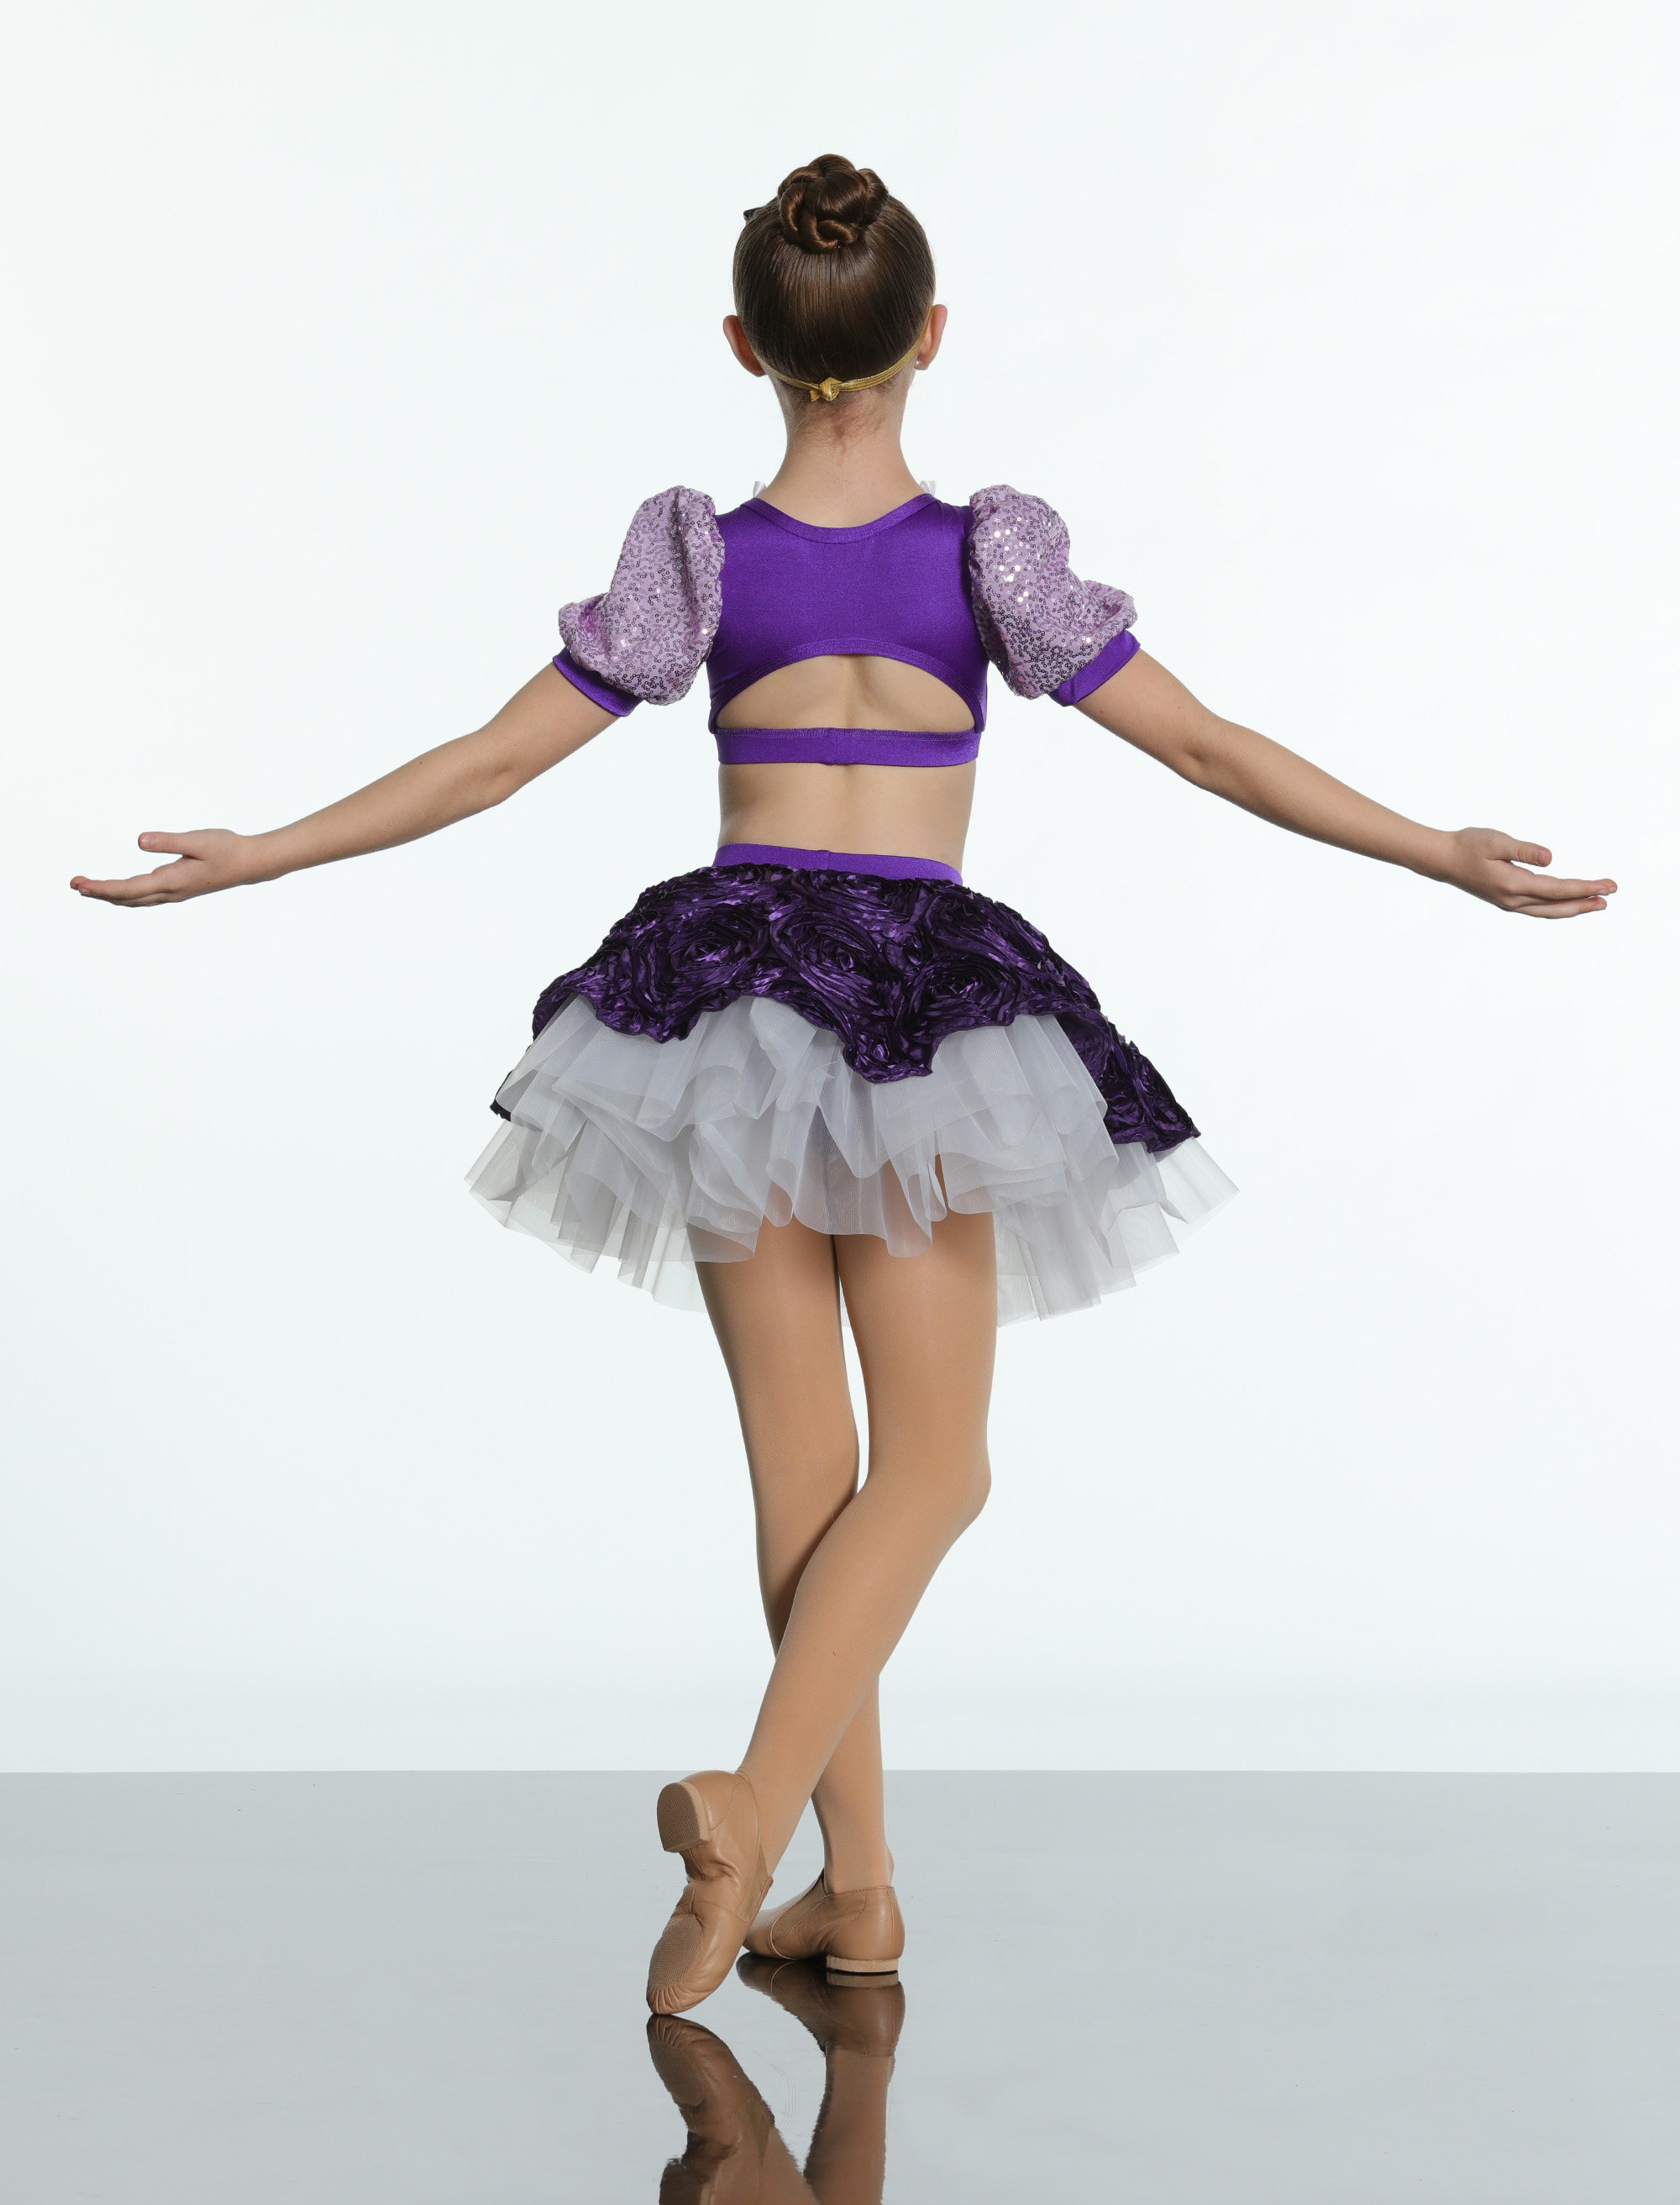 adult ballet shoe sizing